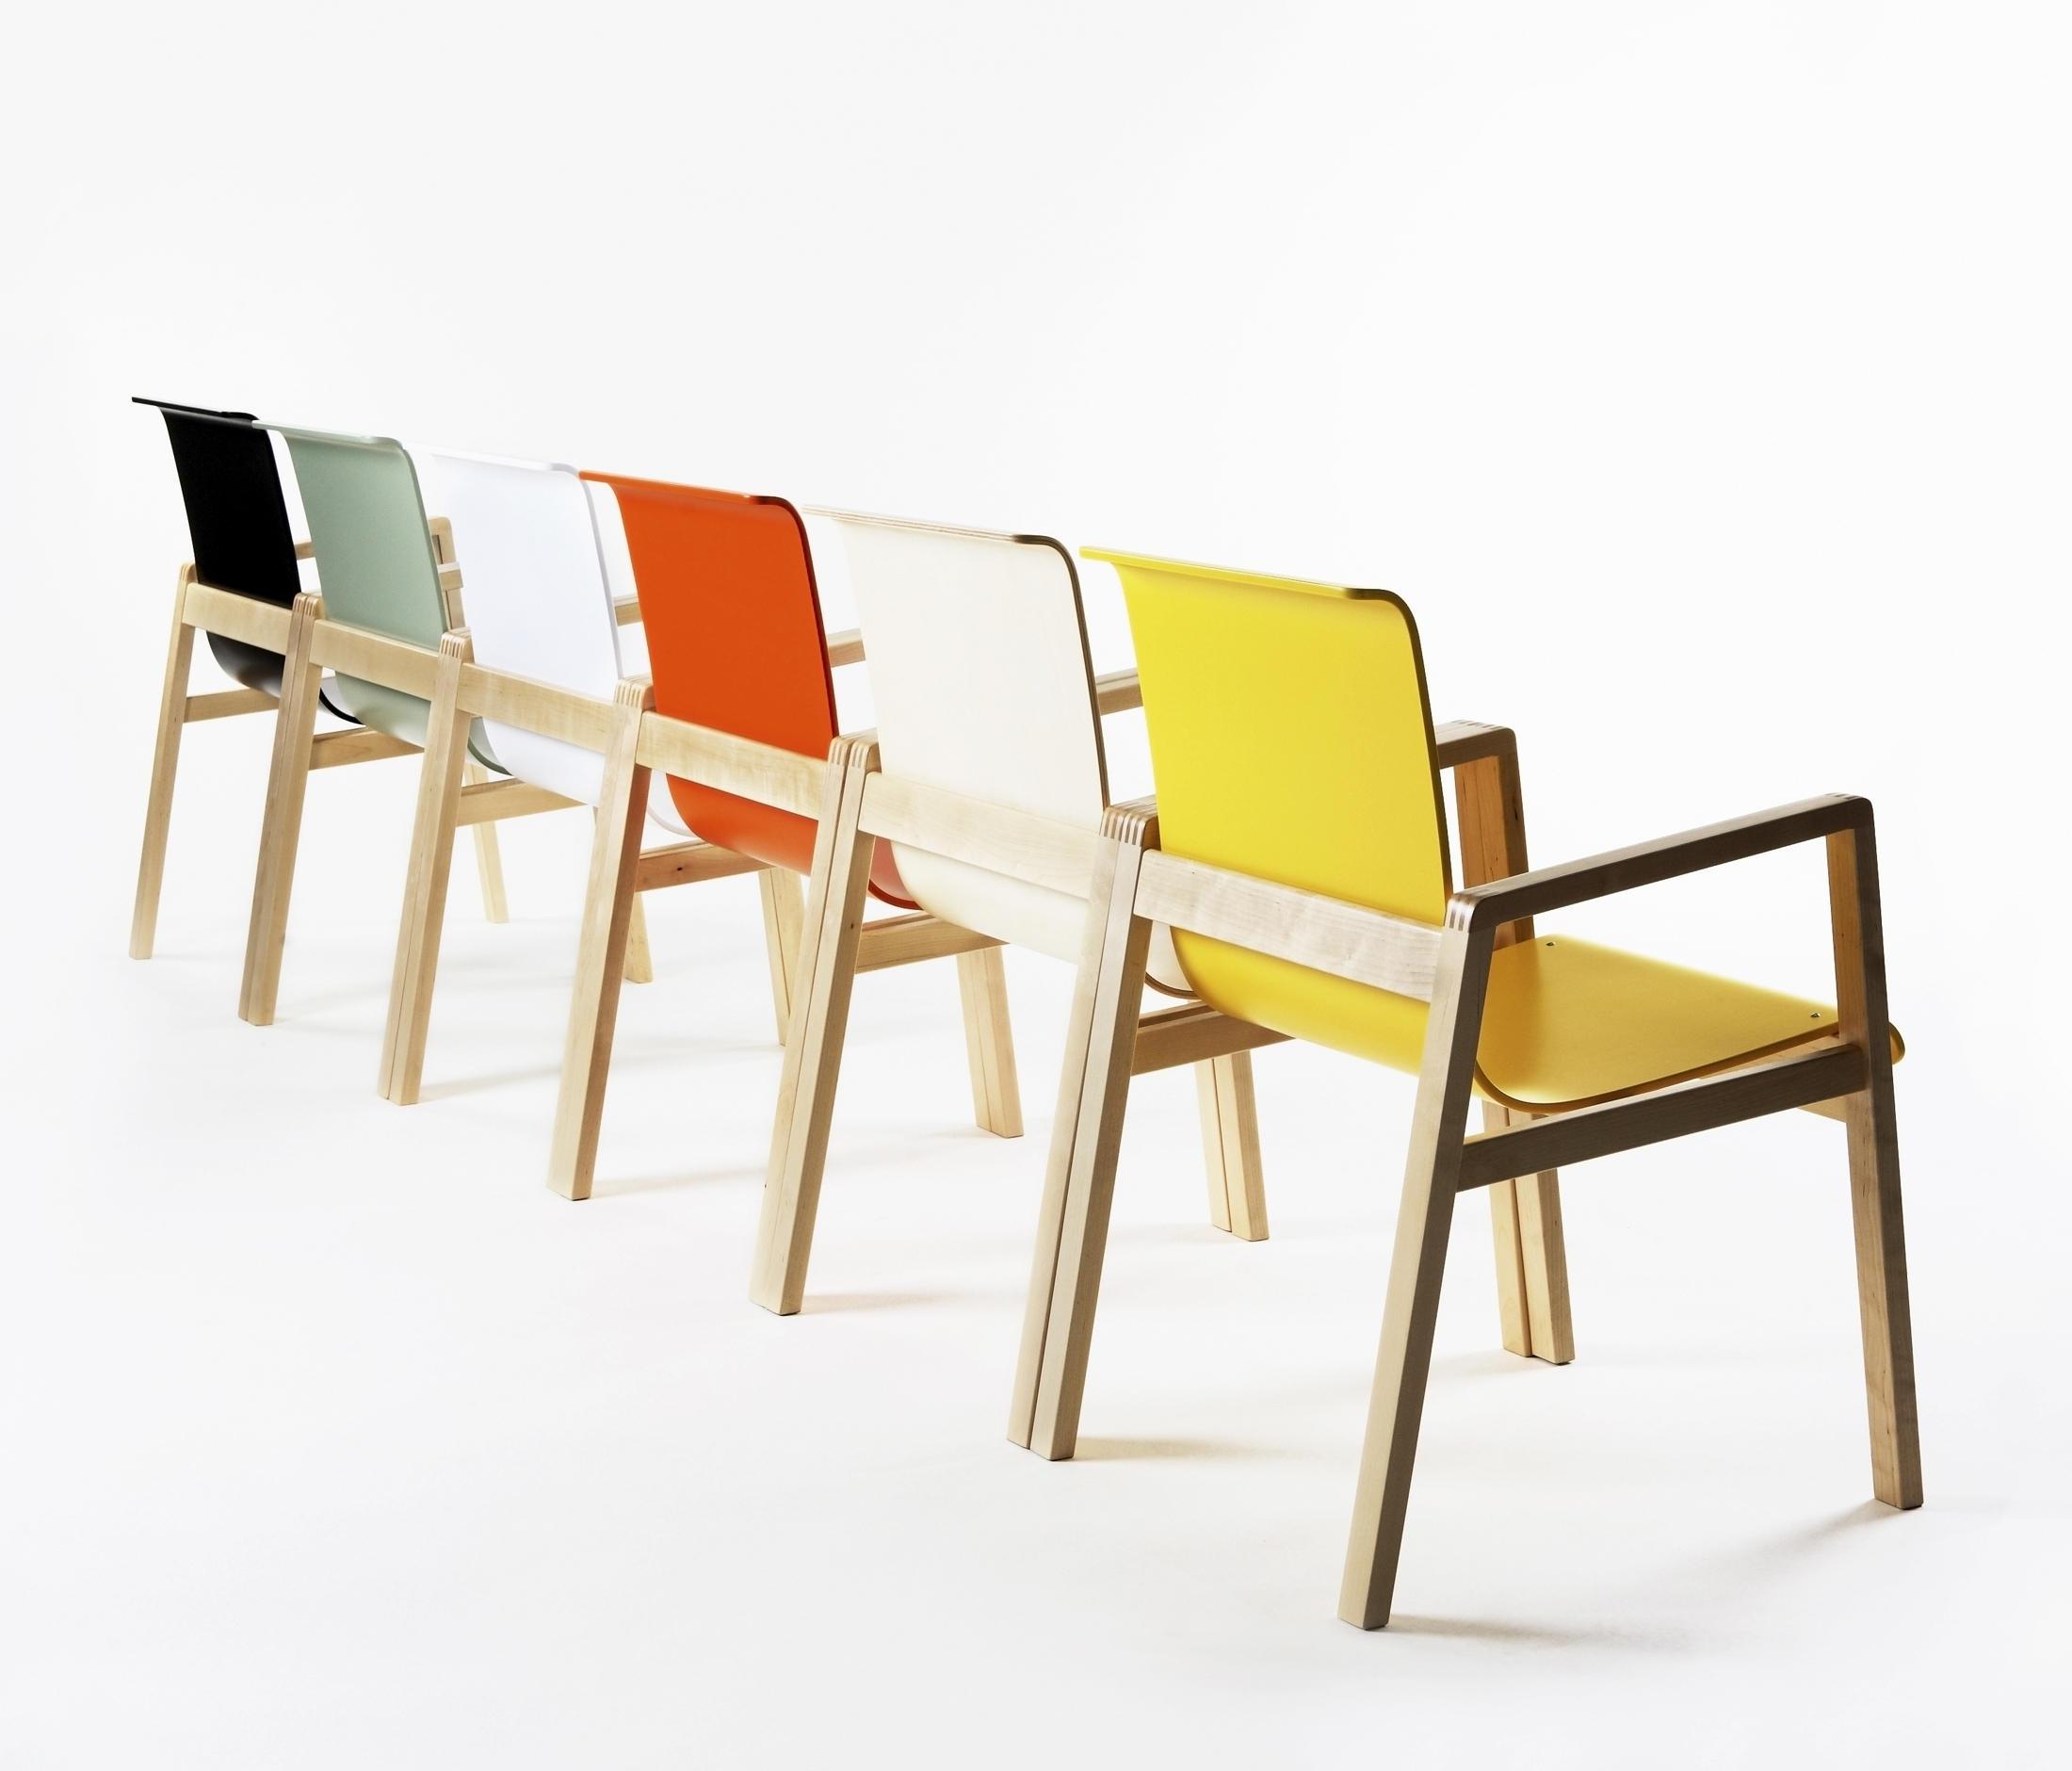 hallway chair   multipurpose chairs from artek  architonic - hallway chair  by artek · hallway chair  by artek